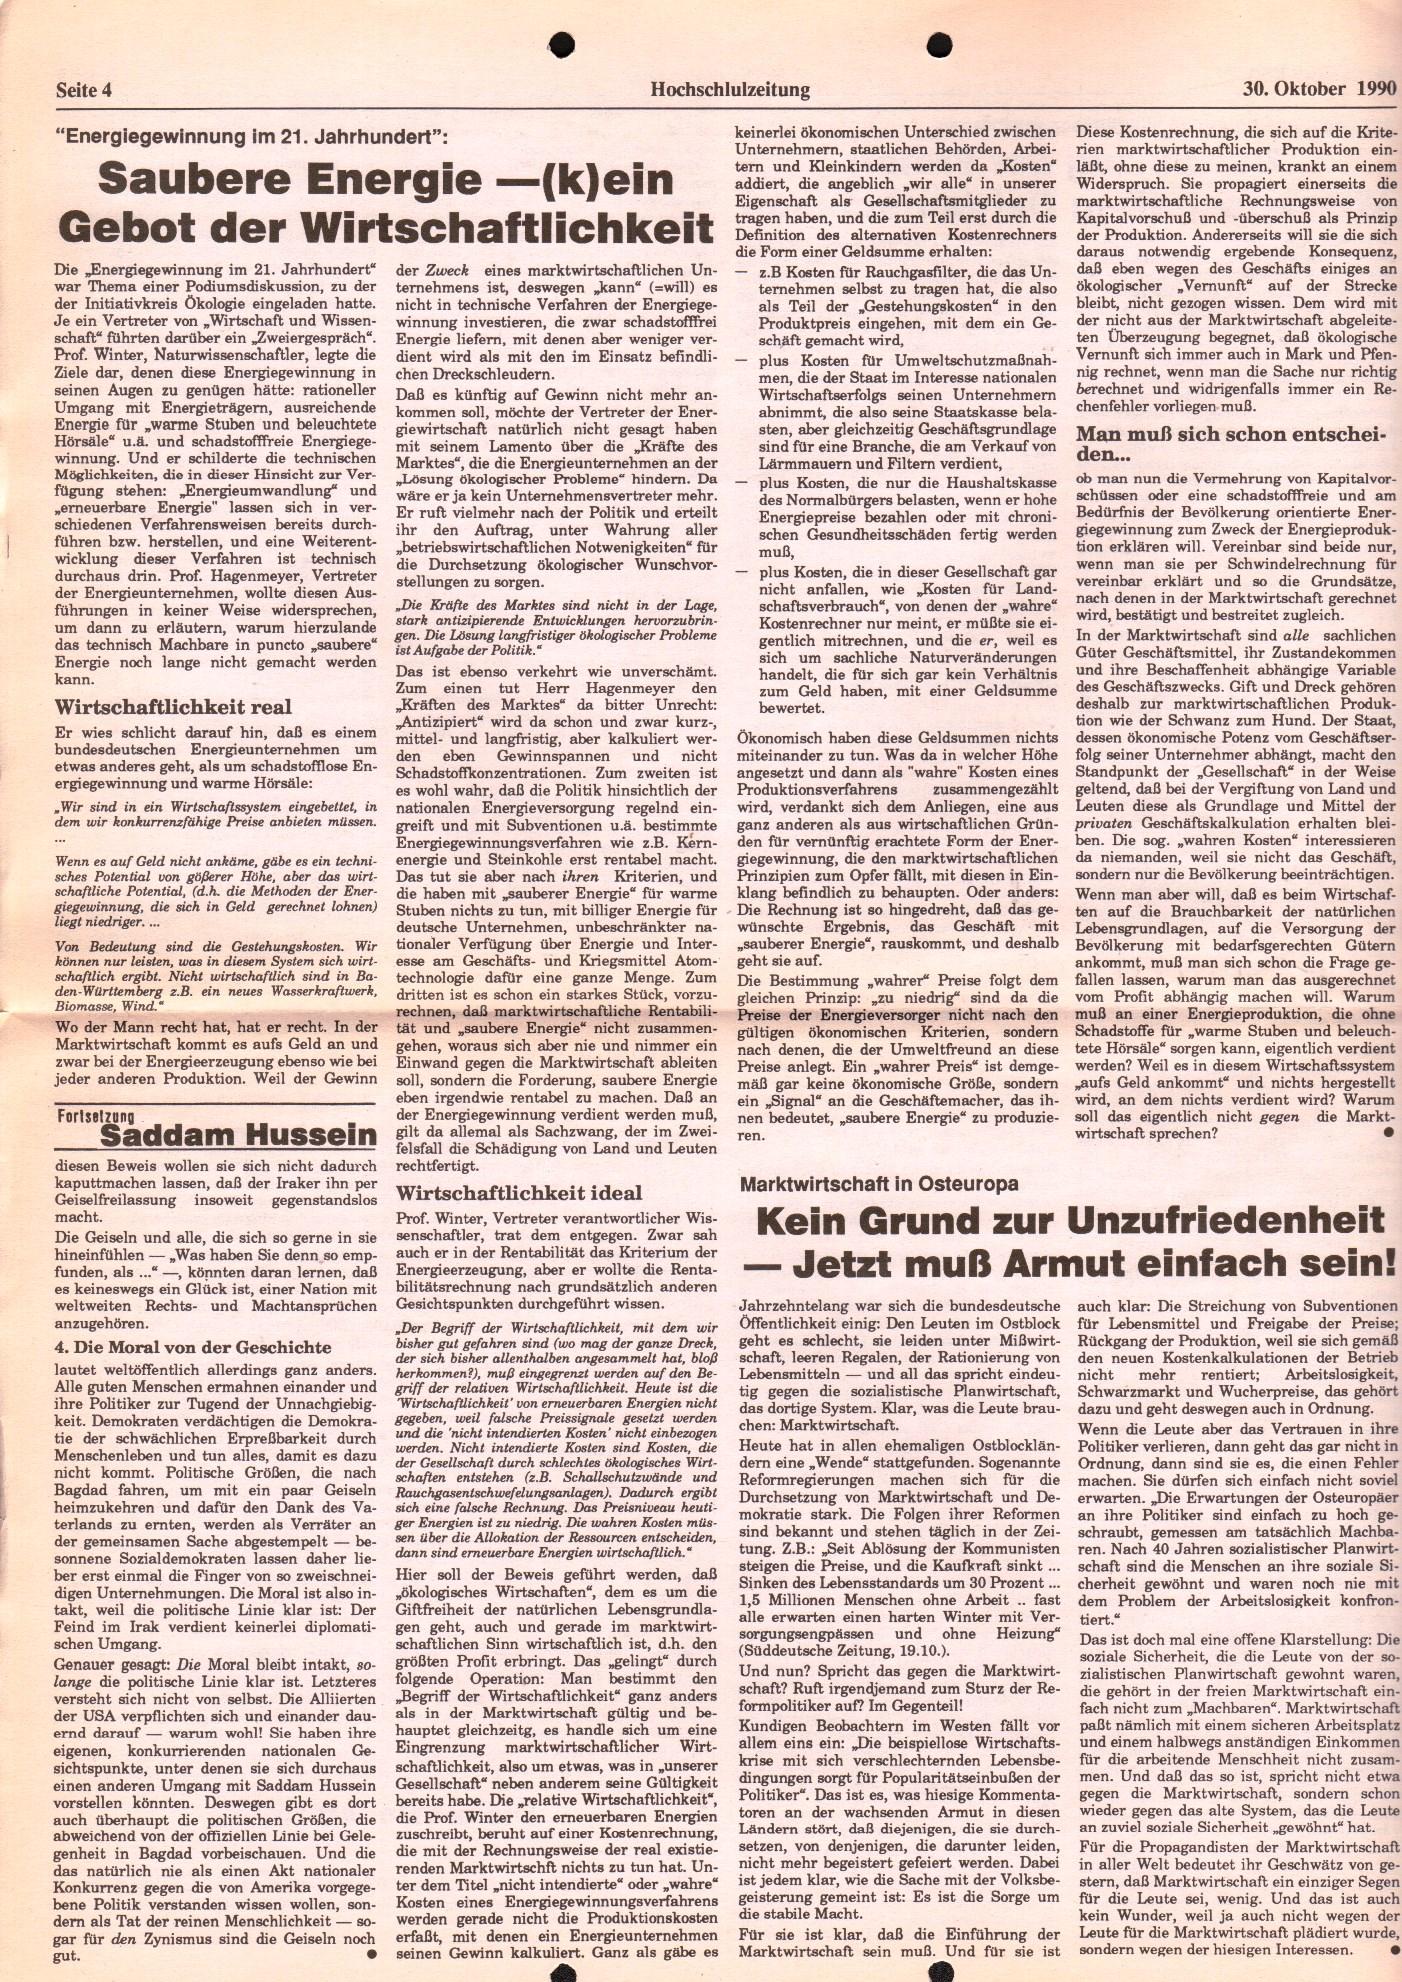 Stuttgart_MG_Hochschulzeitung_1990_11_04